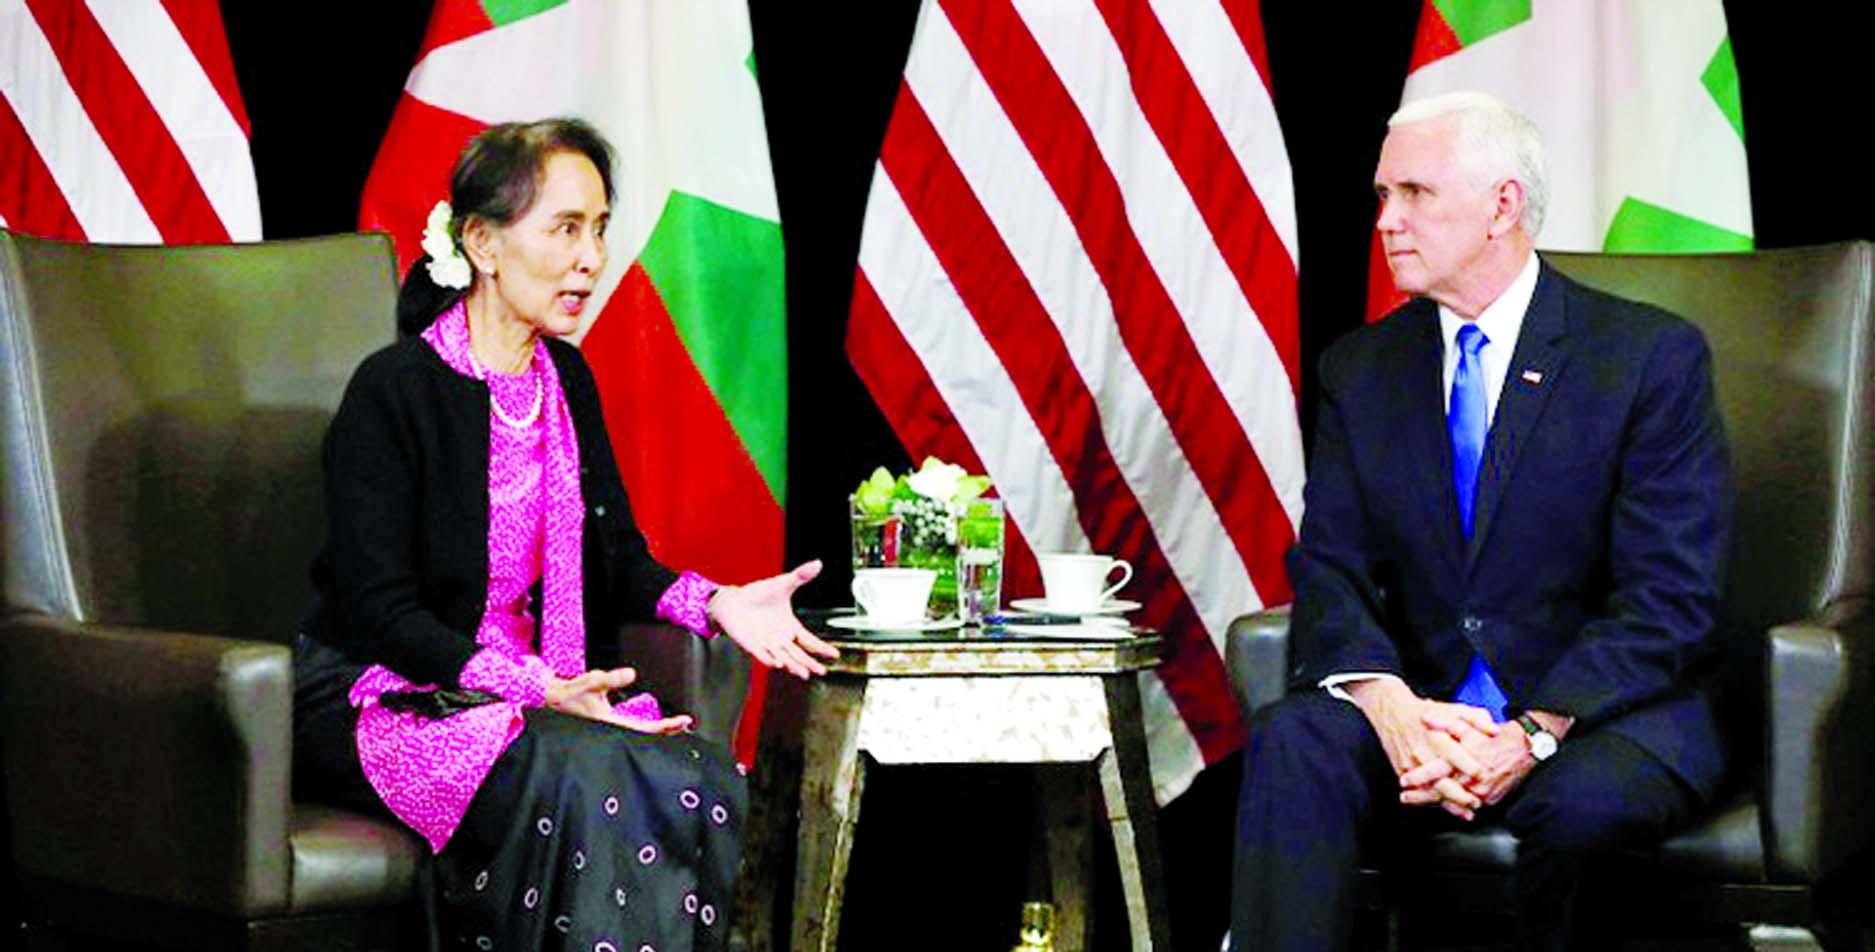 Pence issues sharp rebuke to Suu Kyi